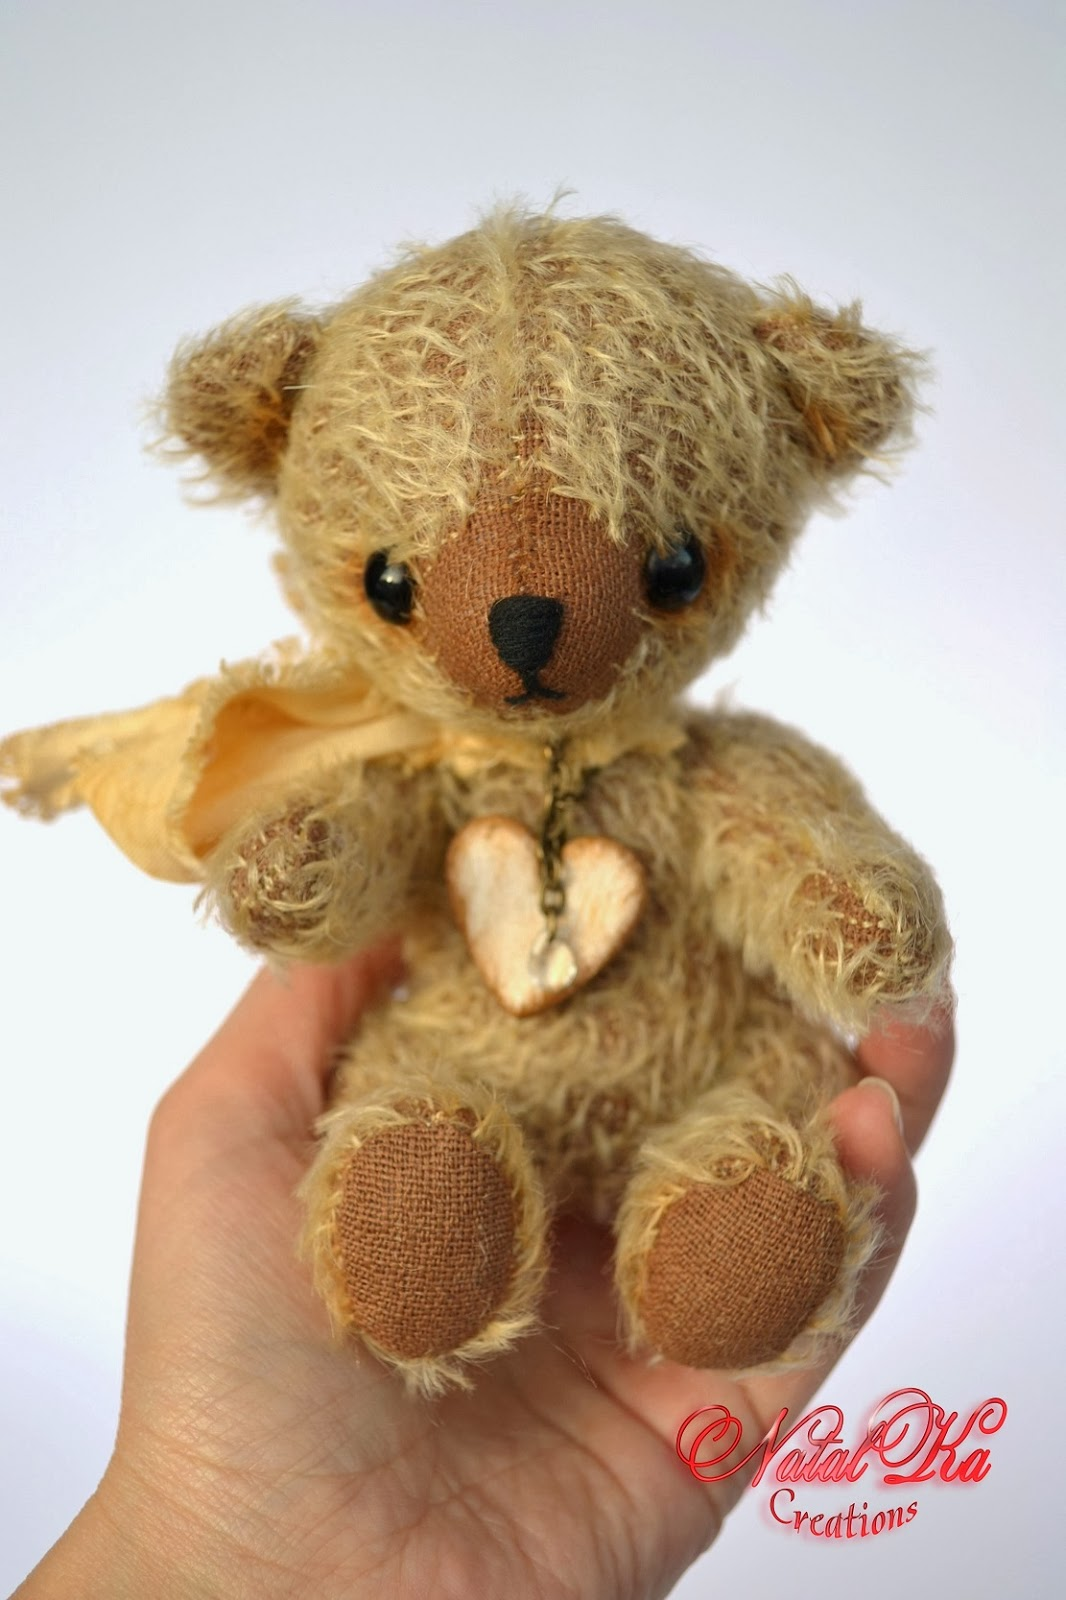 Artist teddy bear handmade by NatalKa Creations